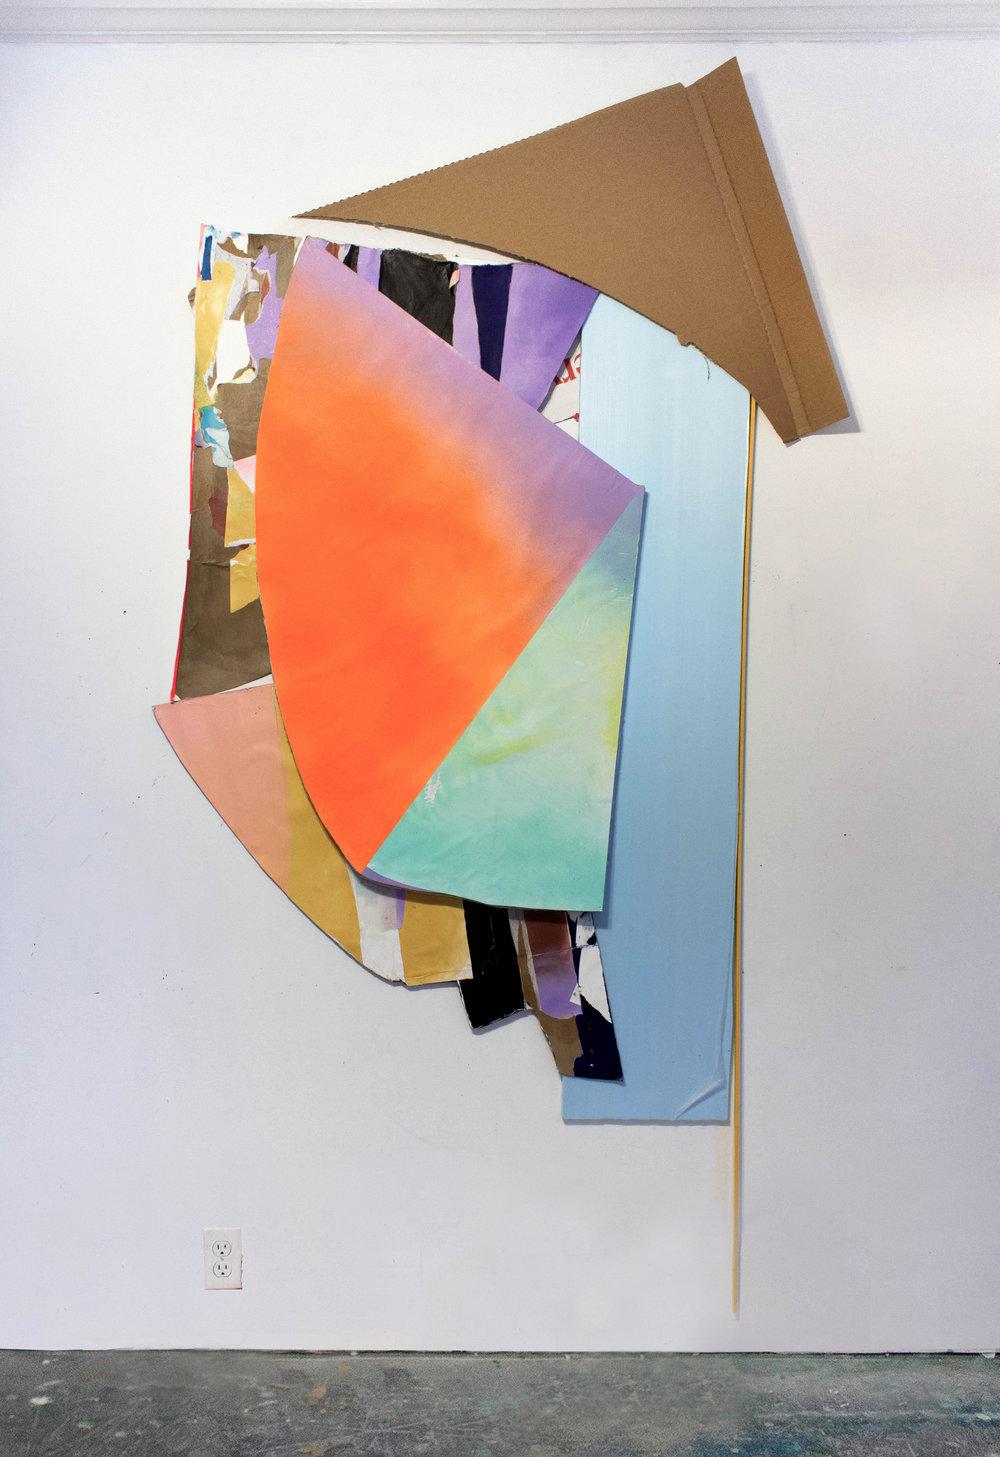 "86""x43"", Styrofoam, Cardboard, Spray Paint, Collage, Wood, 2018"